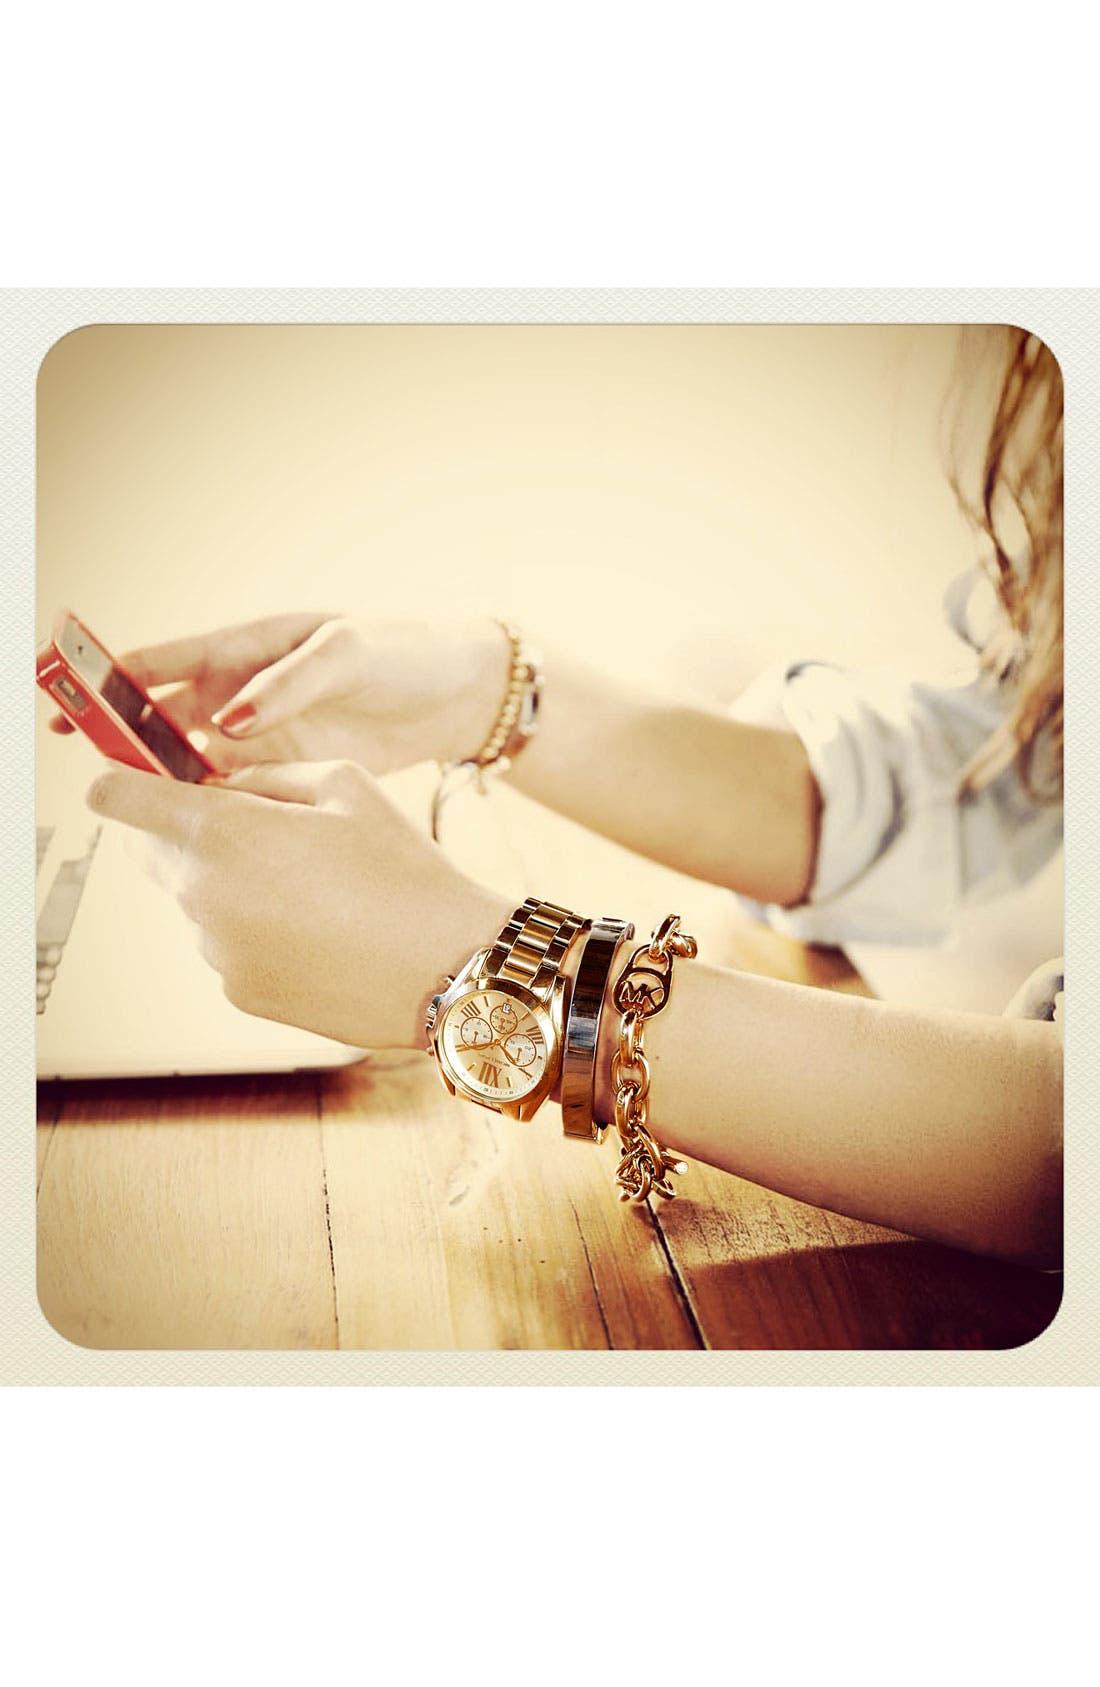 Main Image - Michael Kors Watch & Bracelets